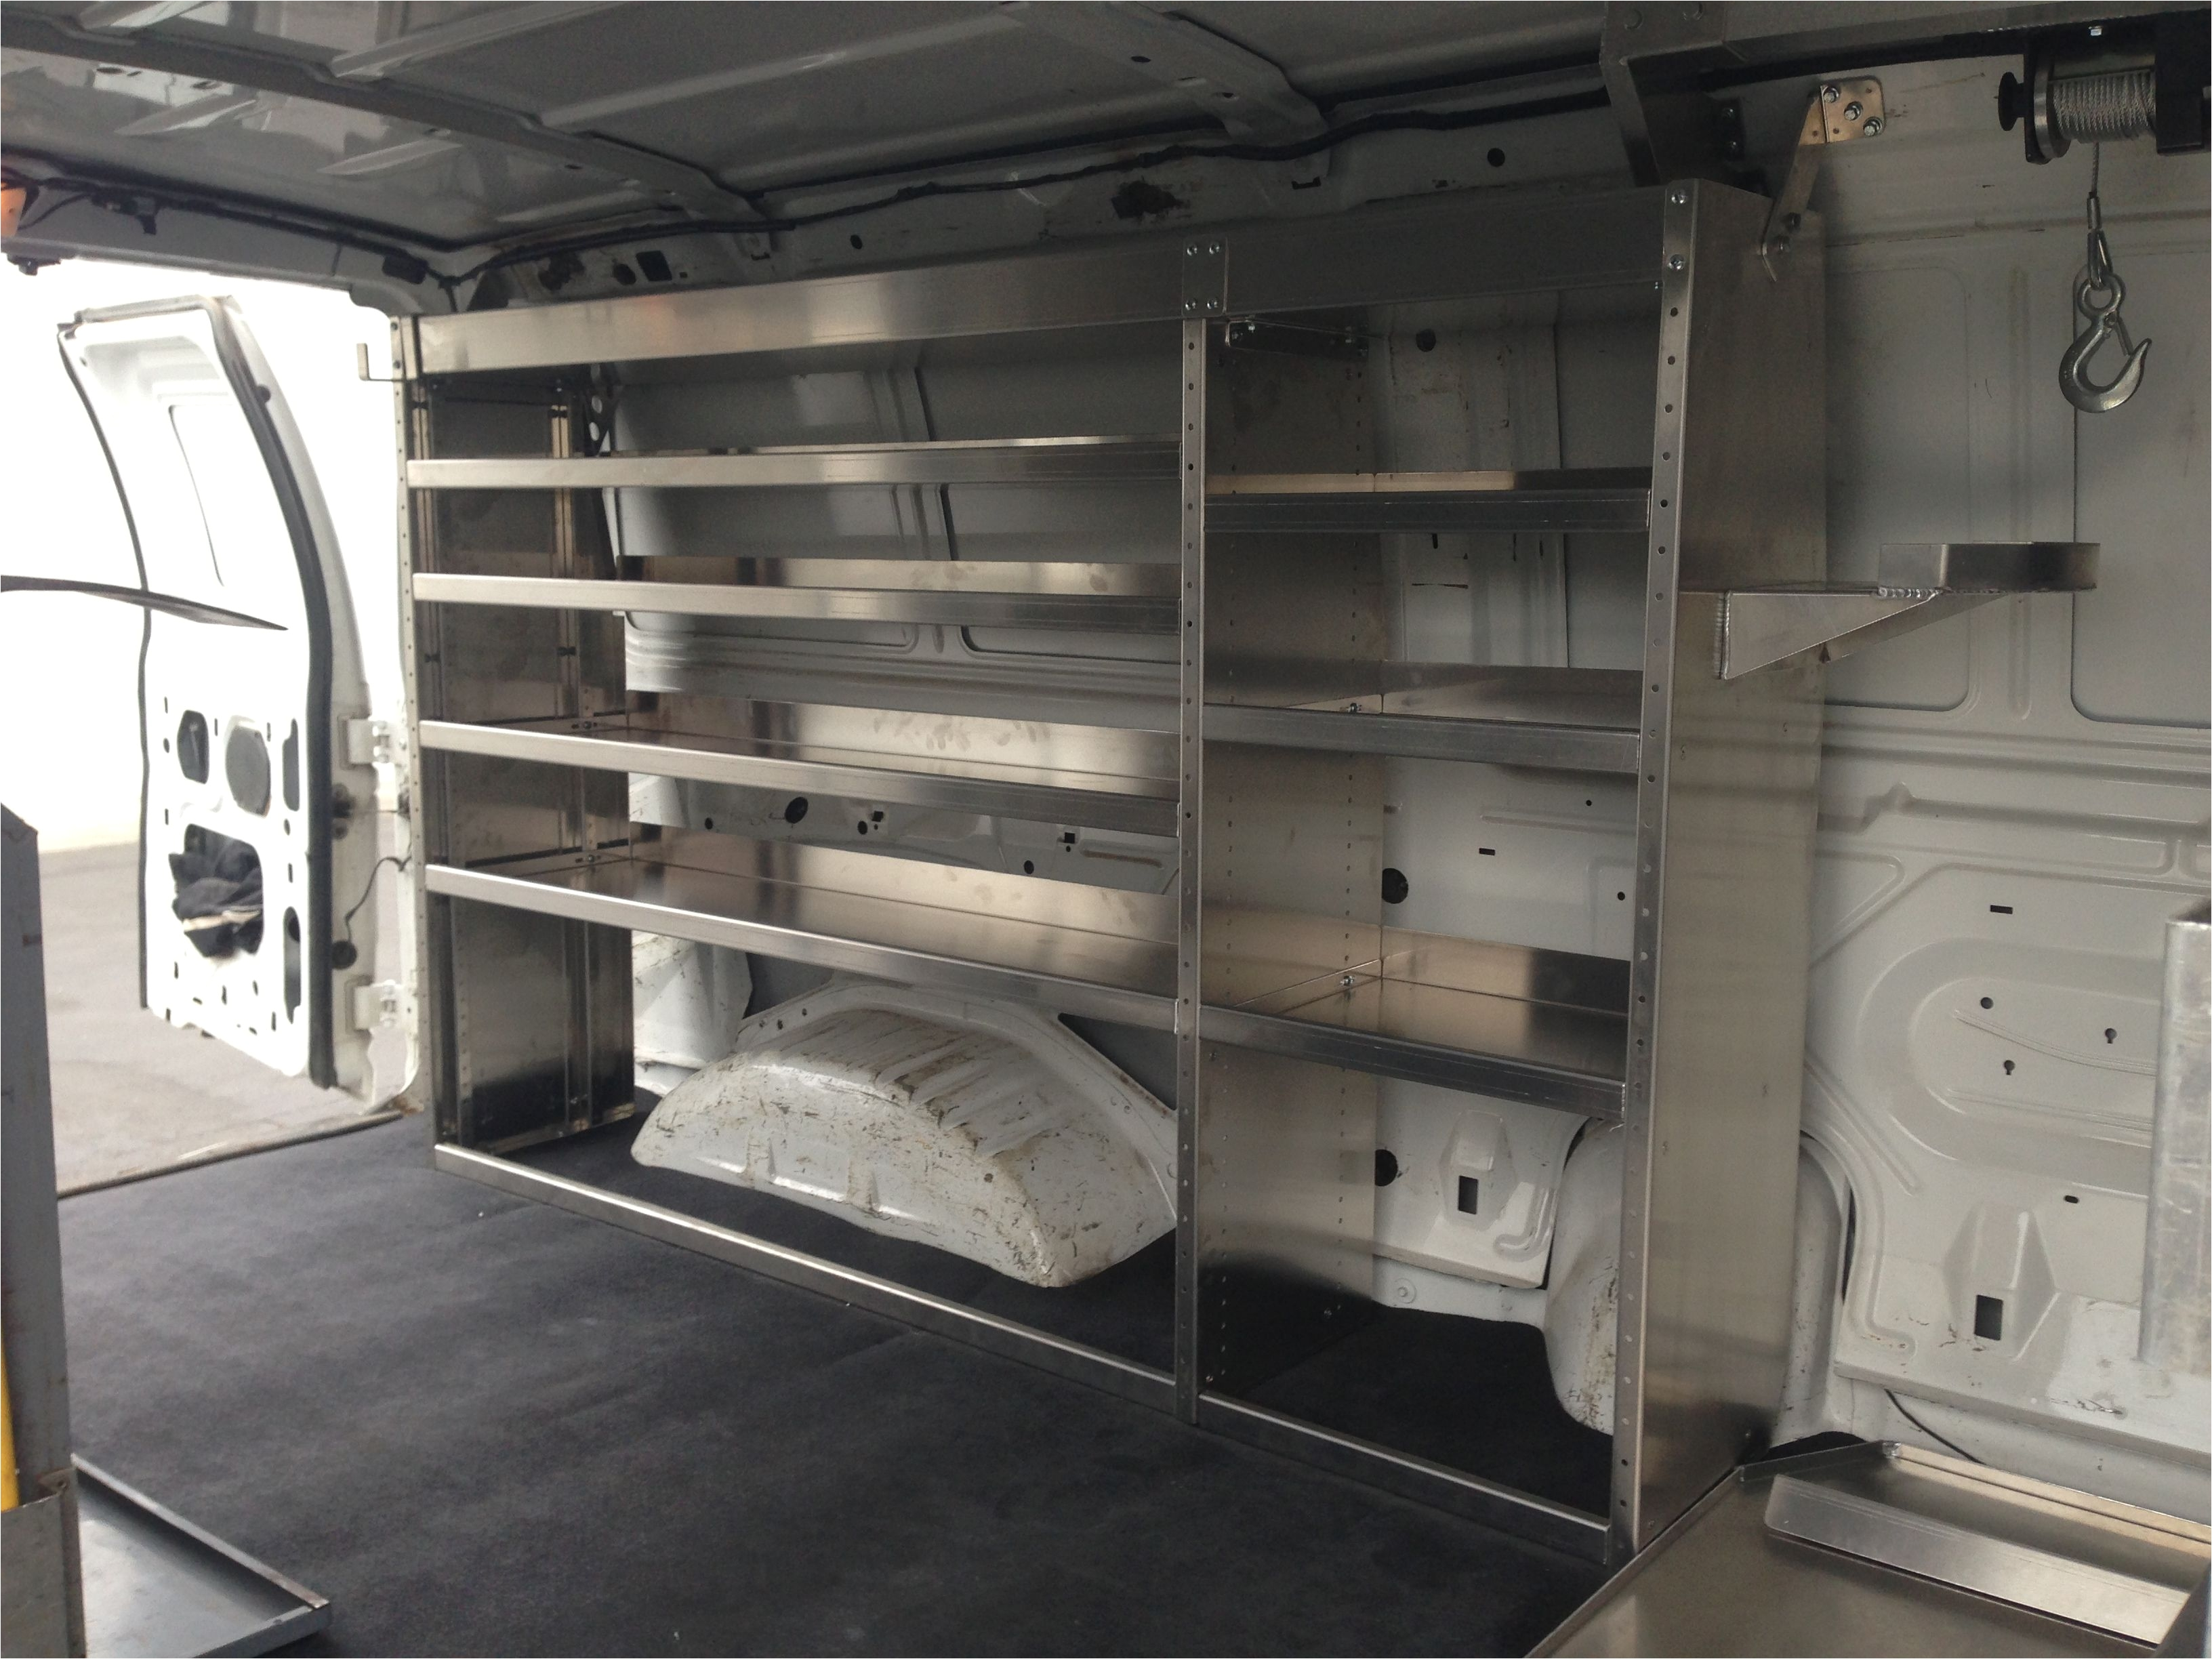 cargo van shelving 360035 a